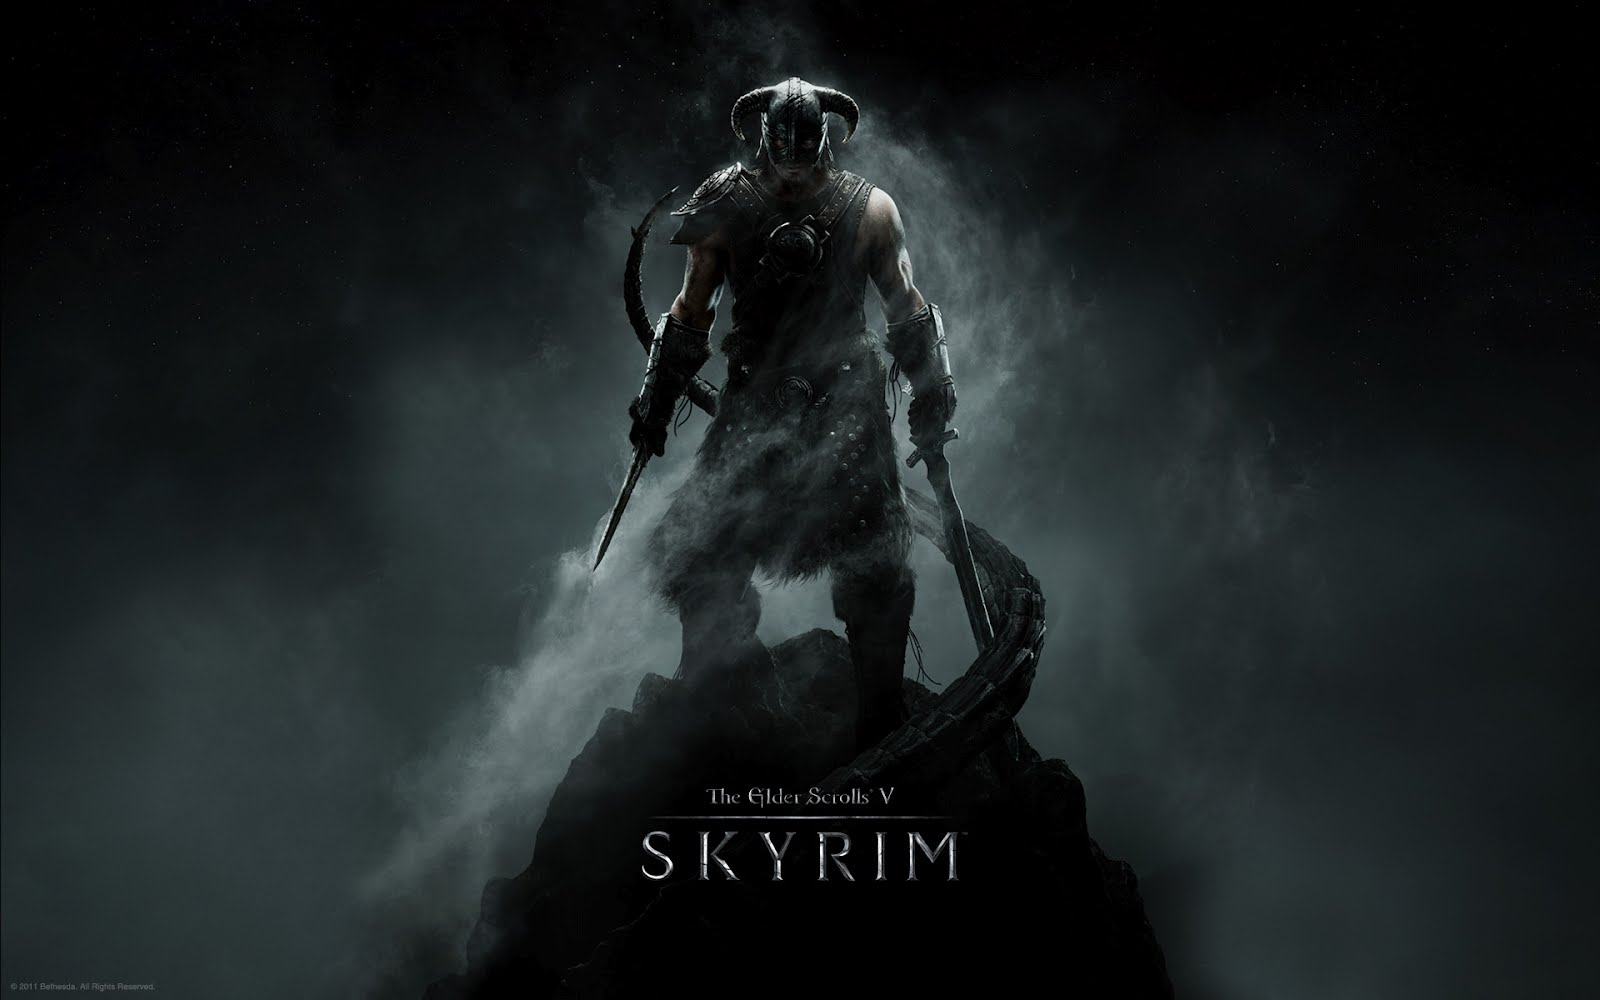 Skyrim Dovahkiin, Dragonborn! [1920x1200]